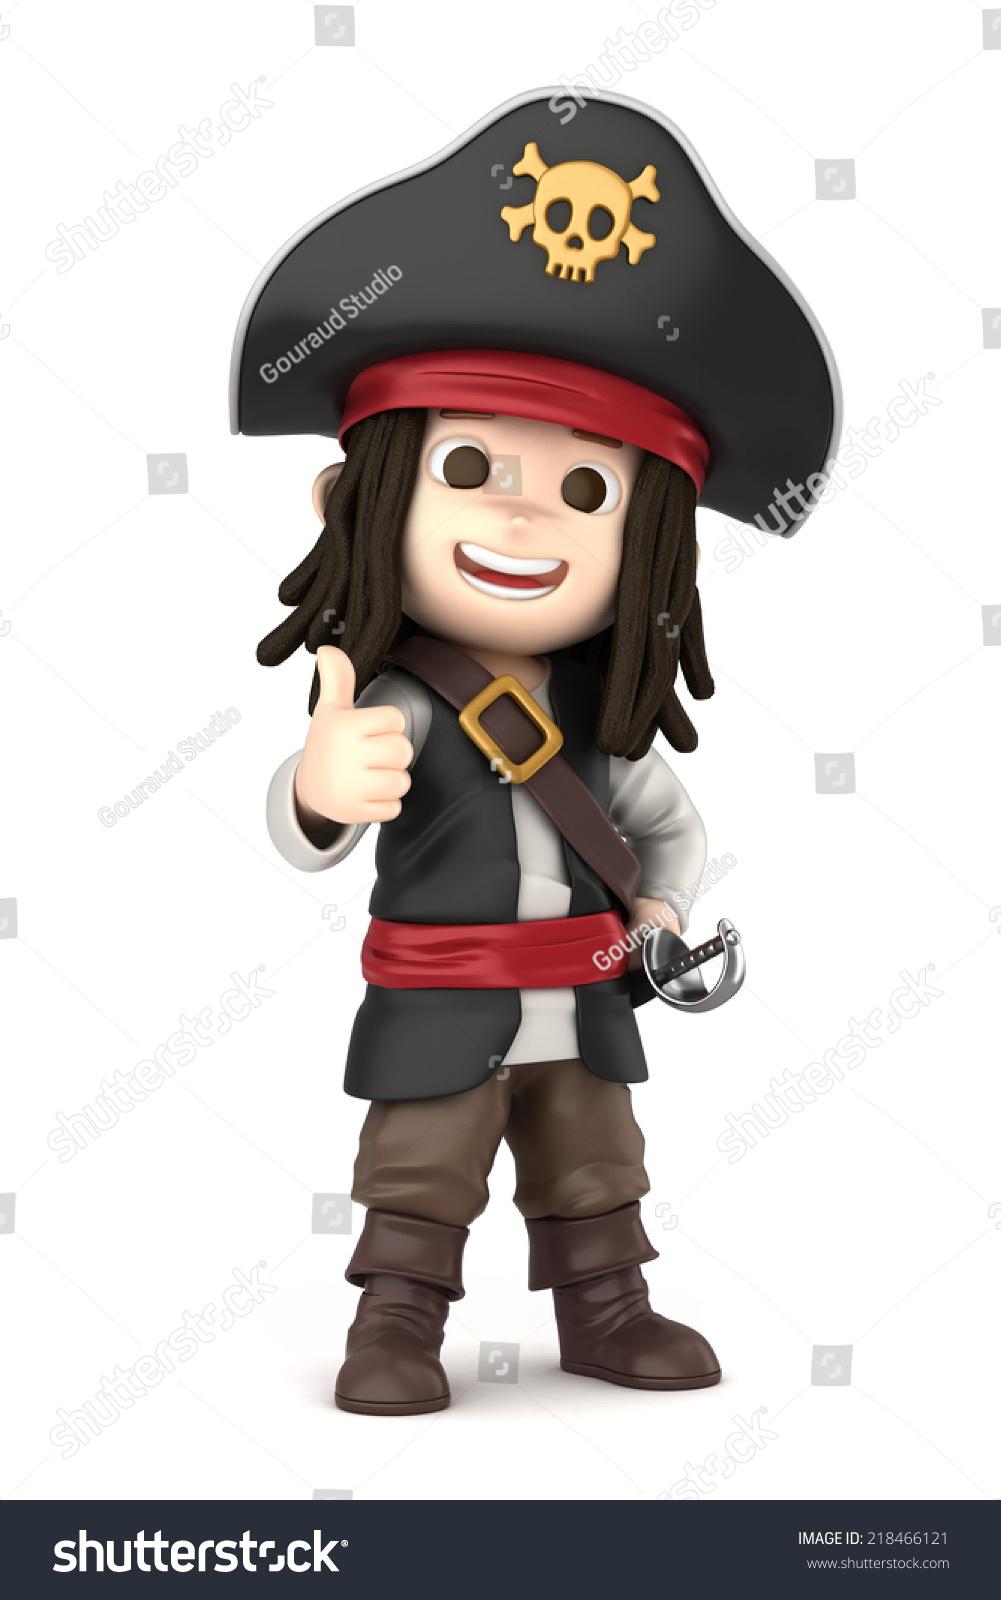 d渲染一个男孩穿着万圣节海盗服装-人物